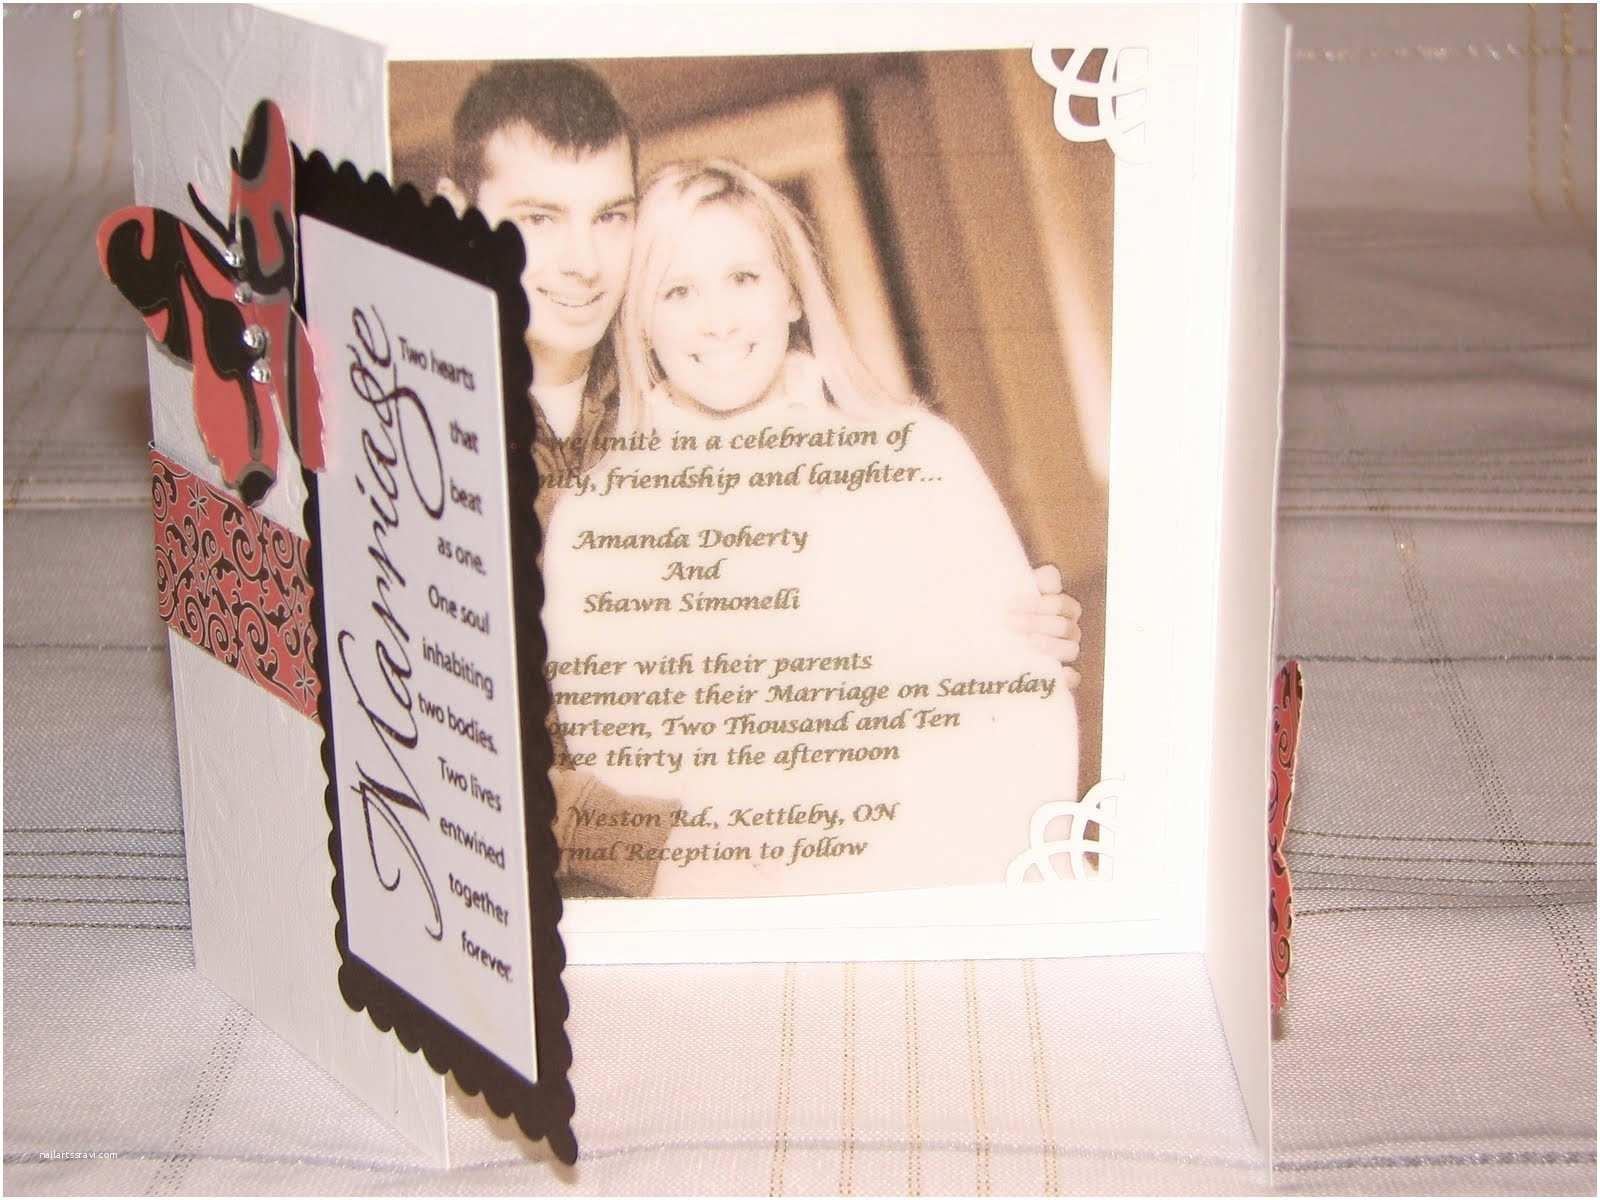 Wedding Invitation Wording From Nephew Old World Designs Wedding Invitations for My Nephew